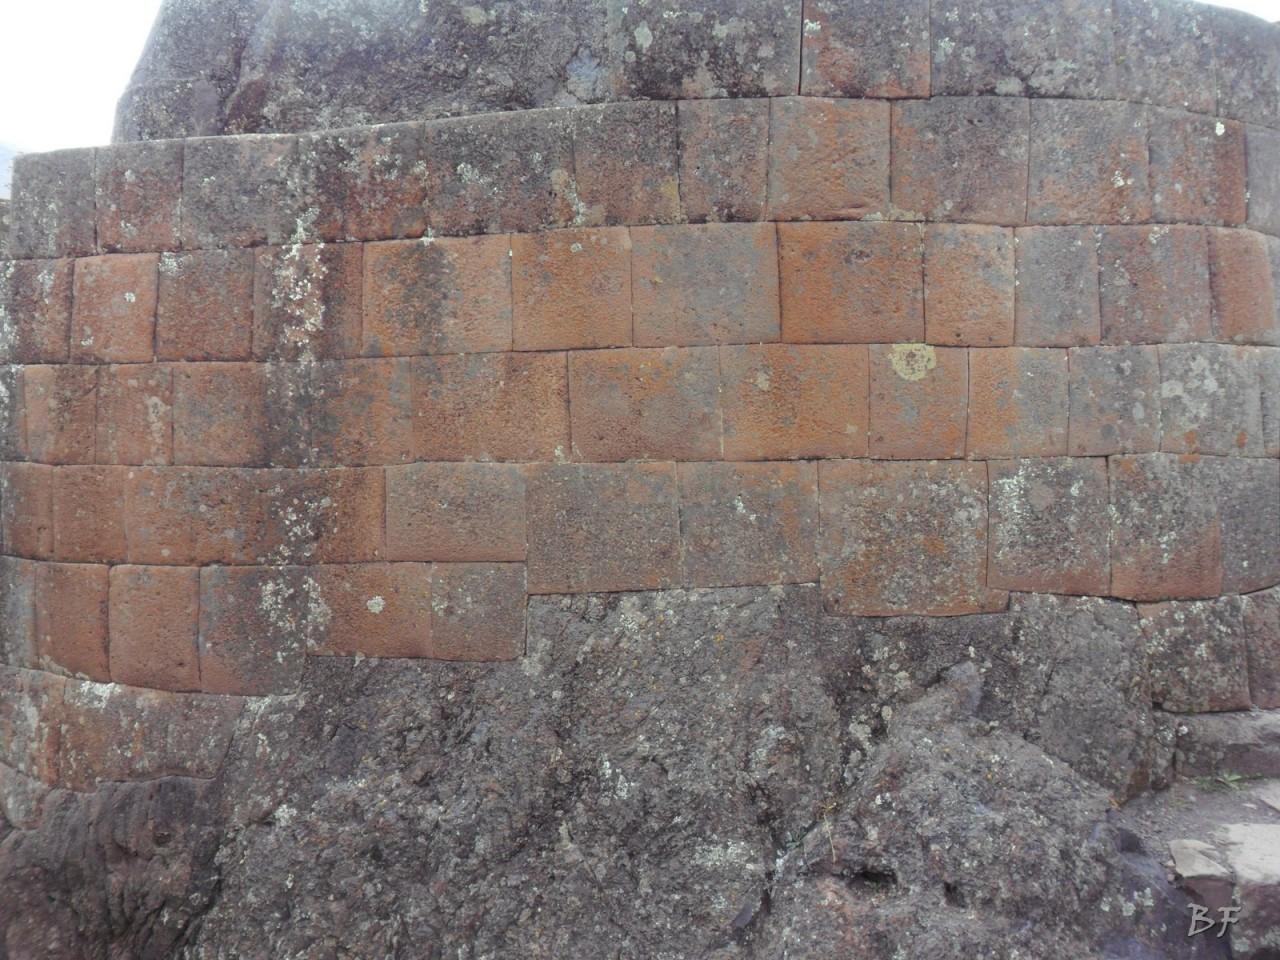 Mura-Poligonali-Megaliti-Altari-Rupestri-Pisac-Cusco-Perù-54